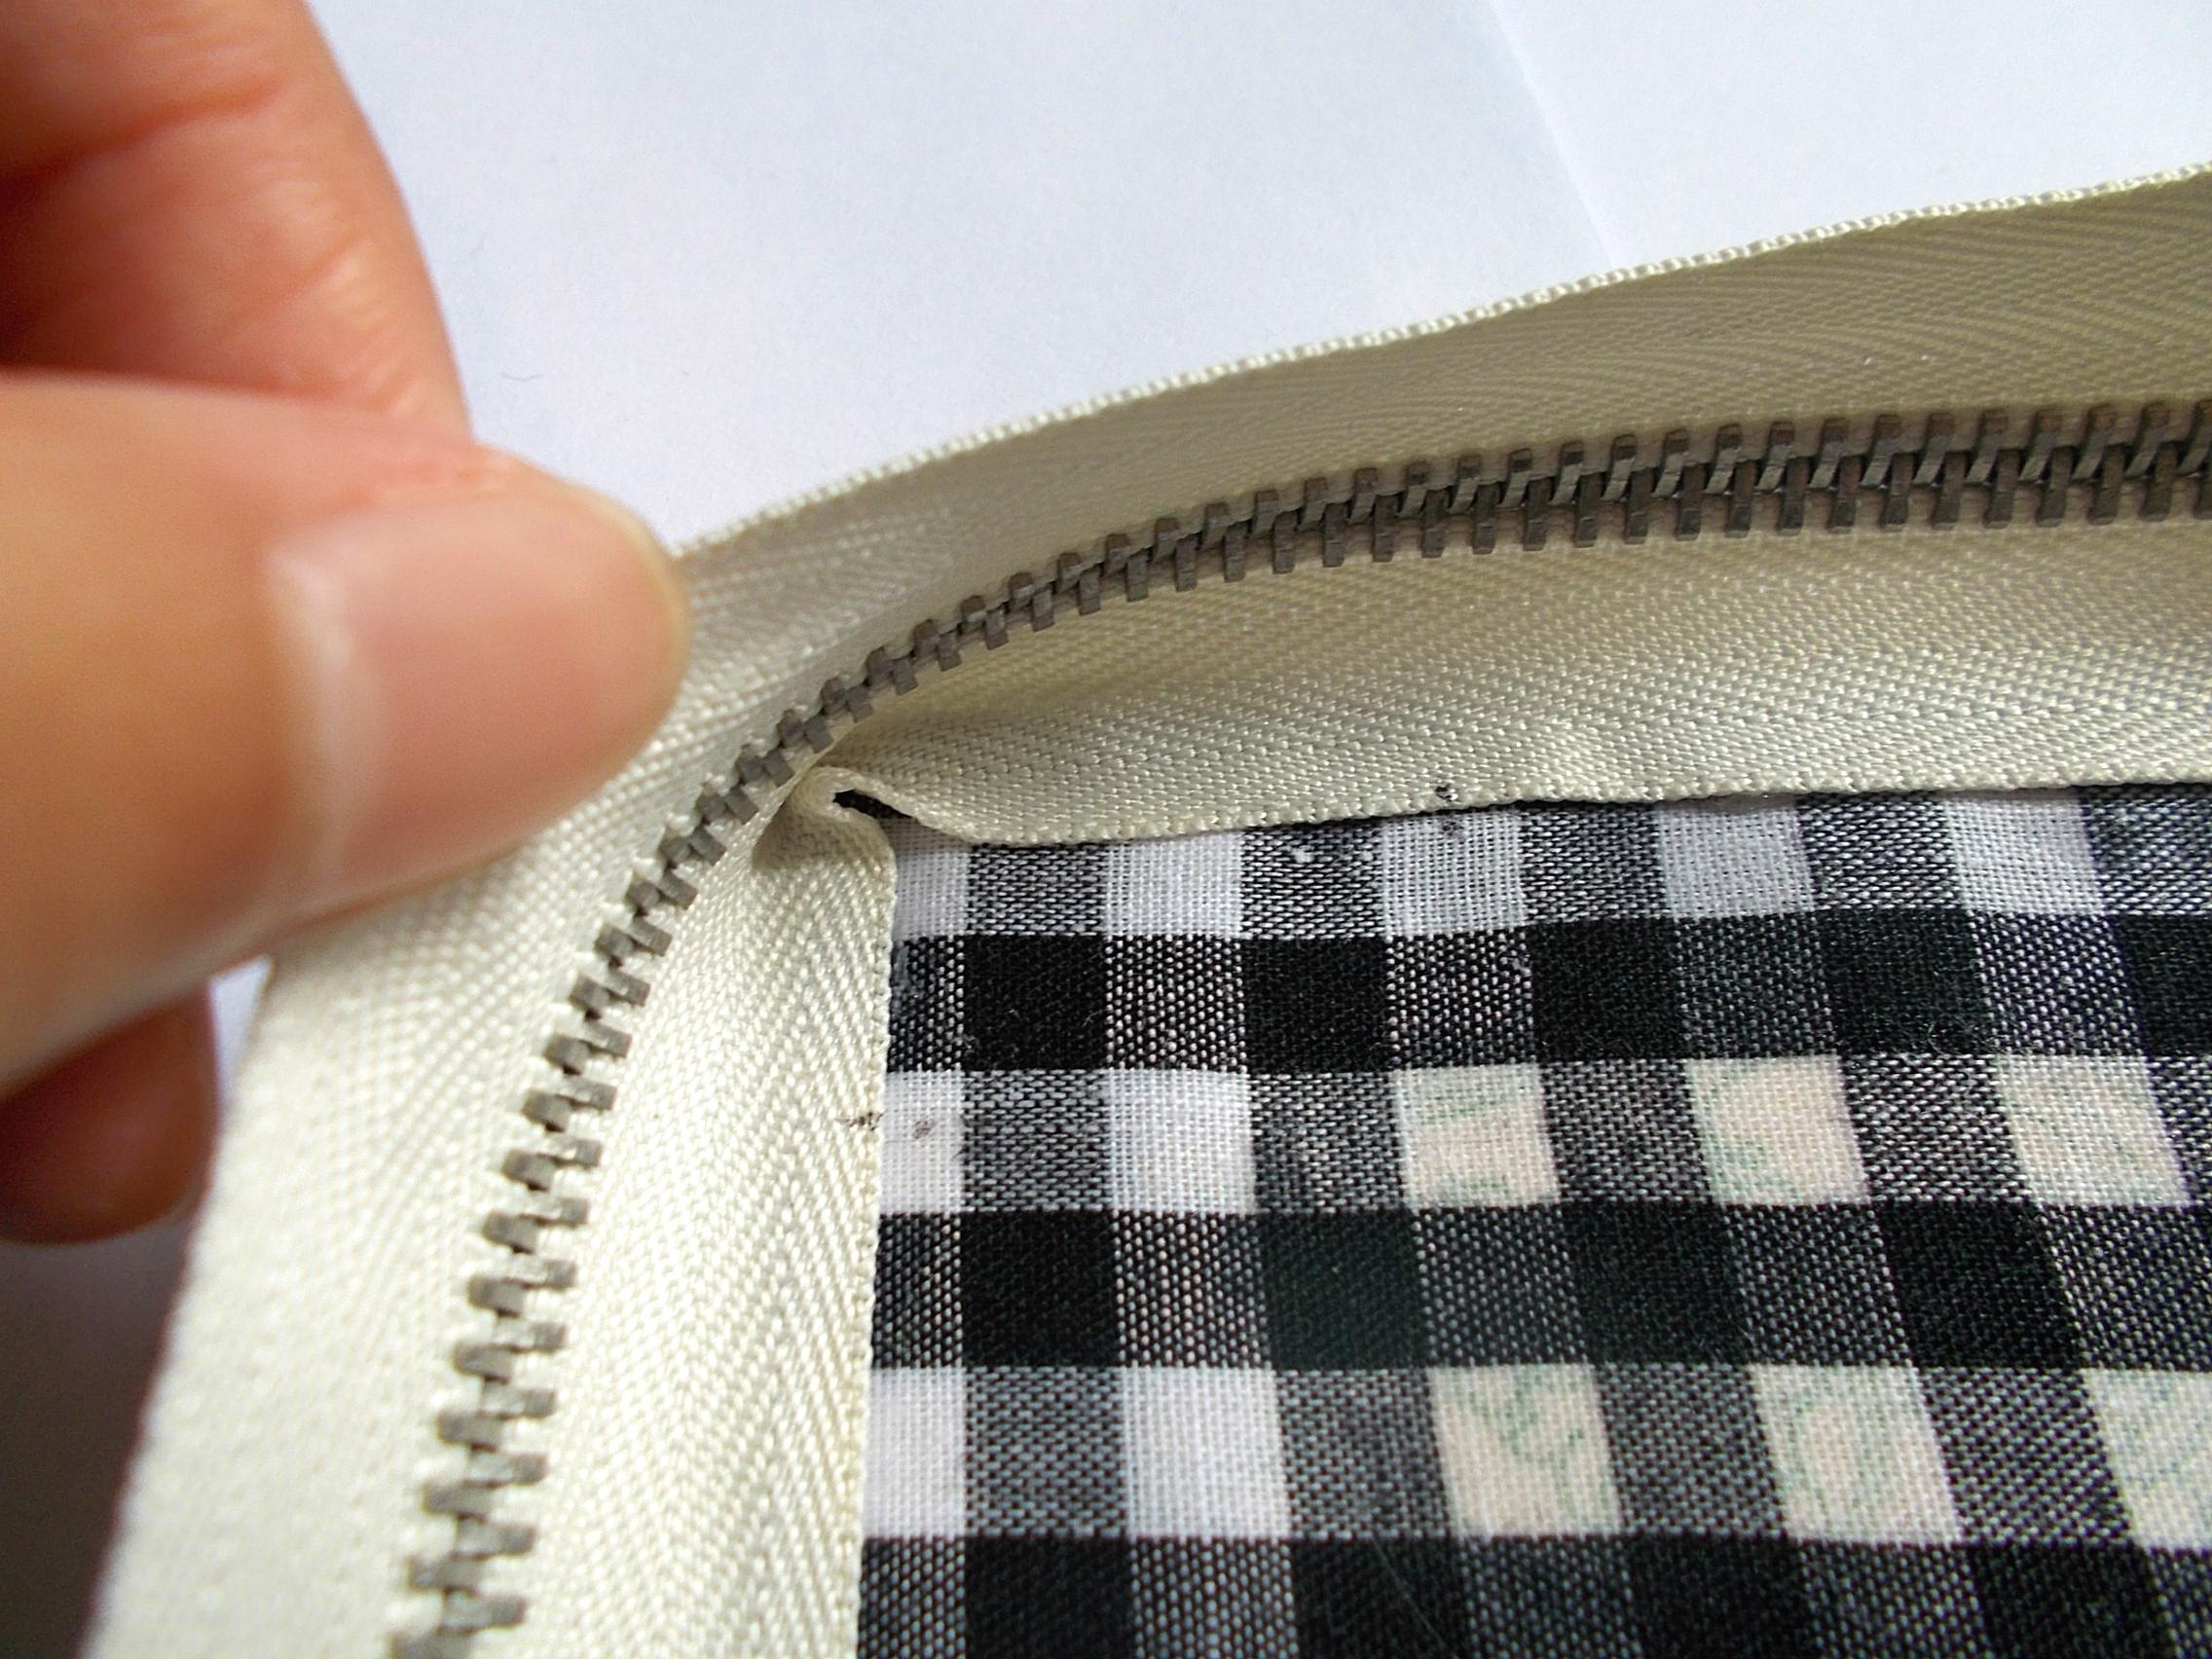 Picture of Attaching Zipper